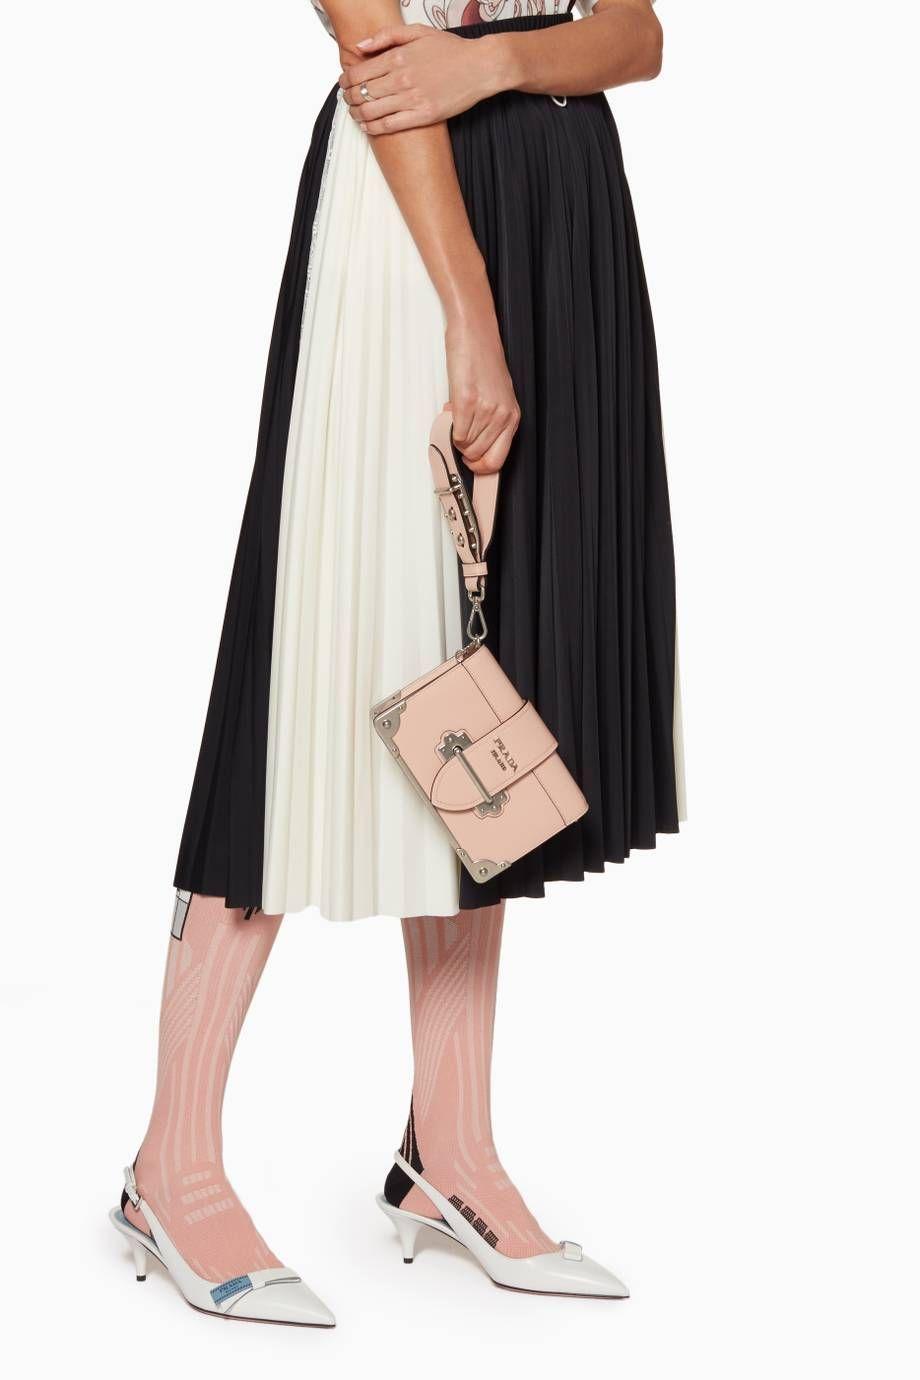 Shop Luxury Prada Pink Mini Cahier Chain Wristlet Shoulder Bag